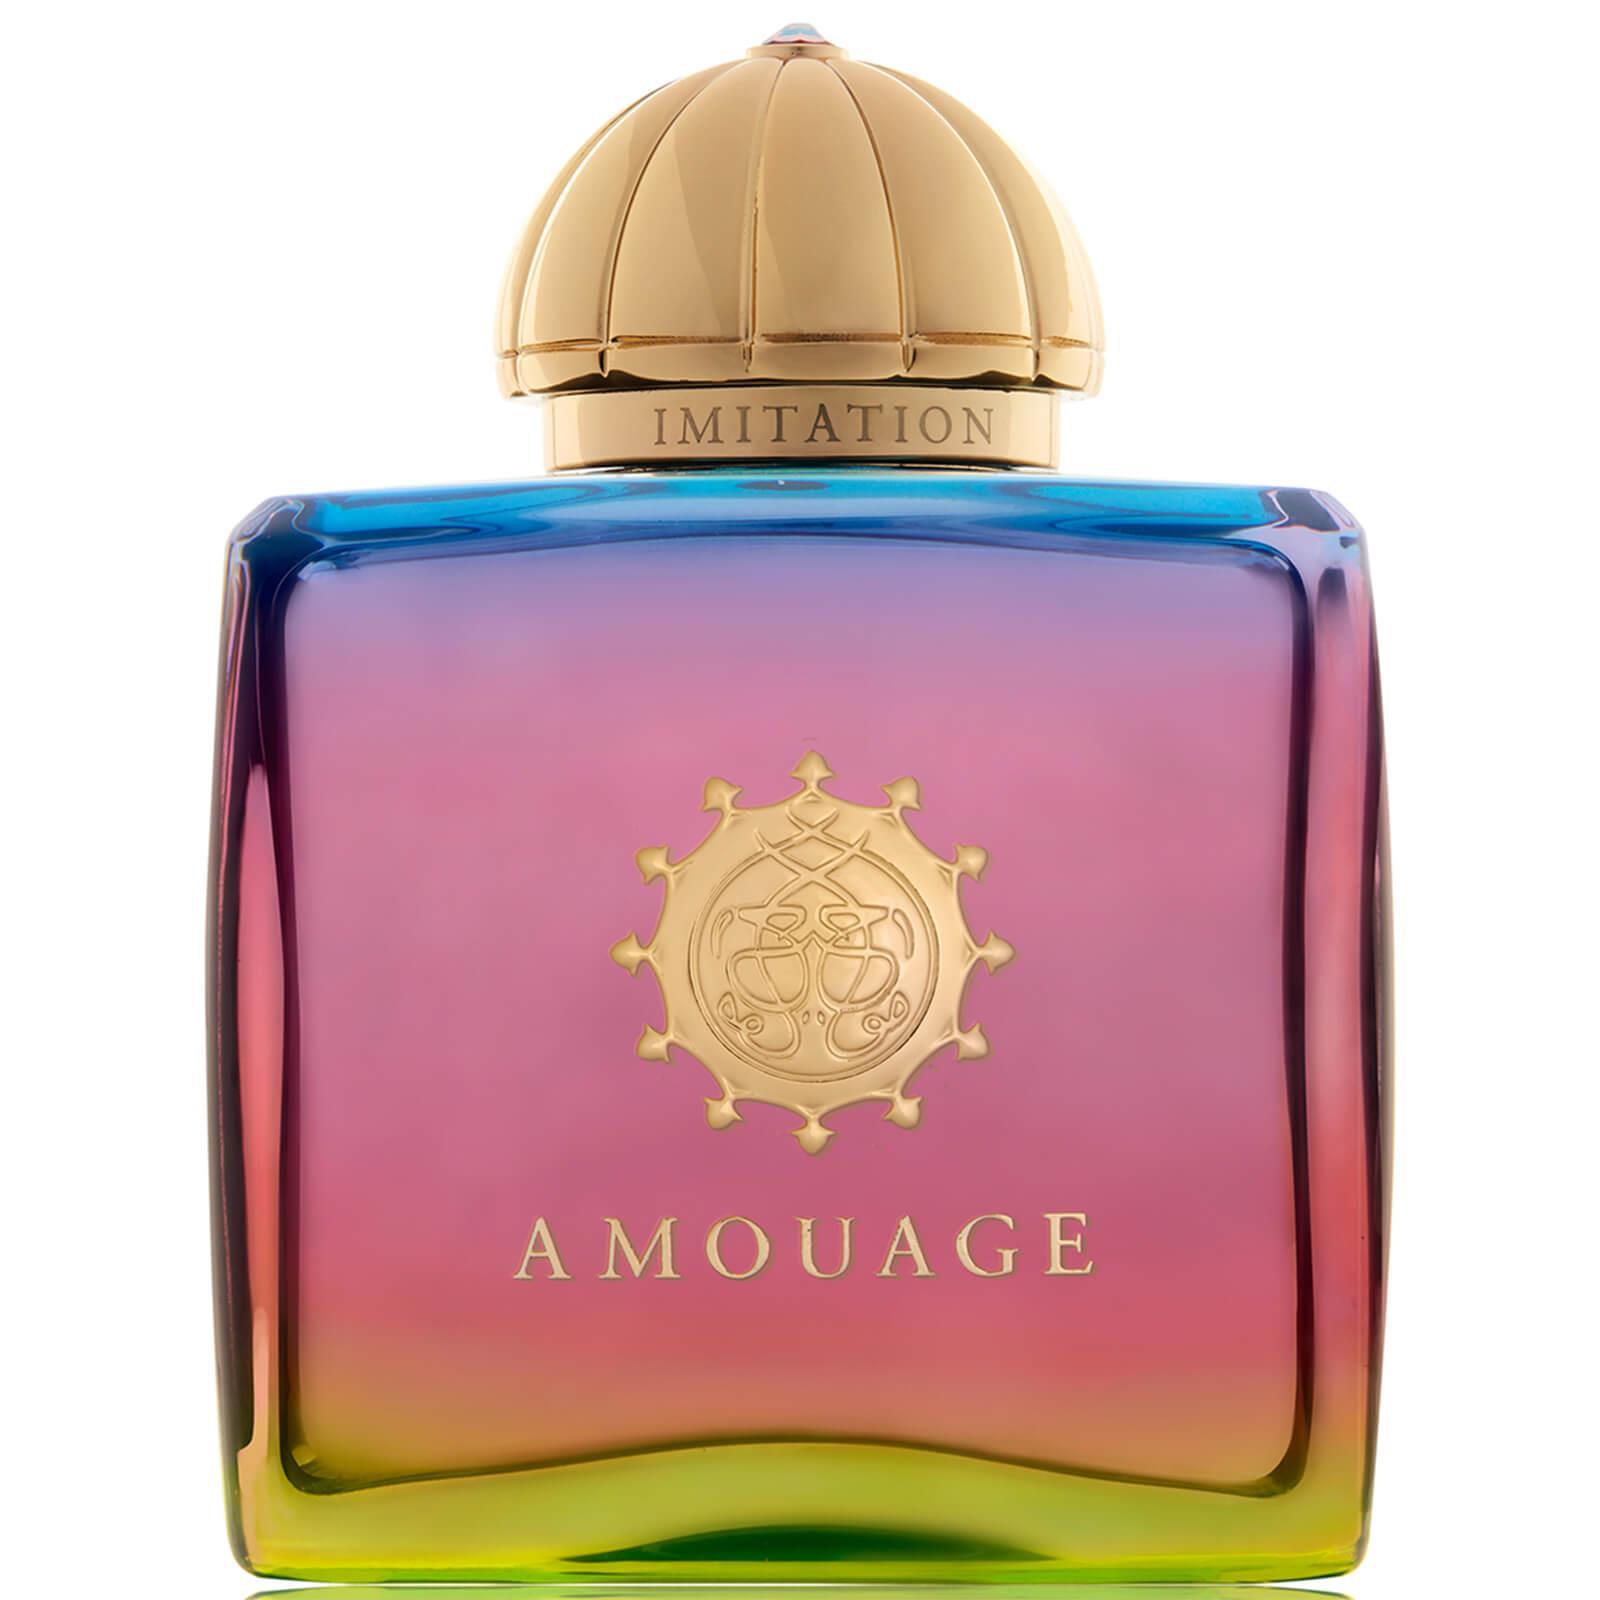 Amouage Imitation EDP 100 ml Kadın Parfüm